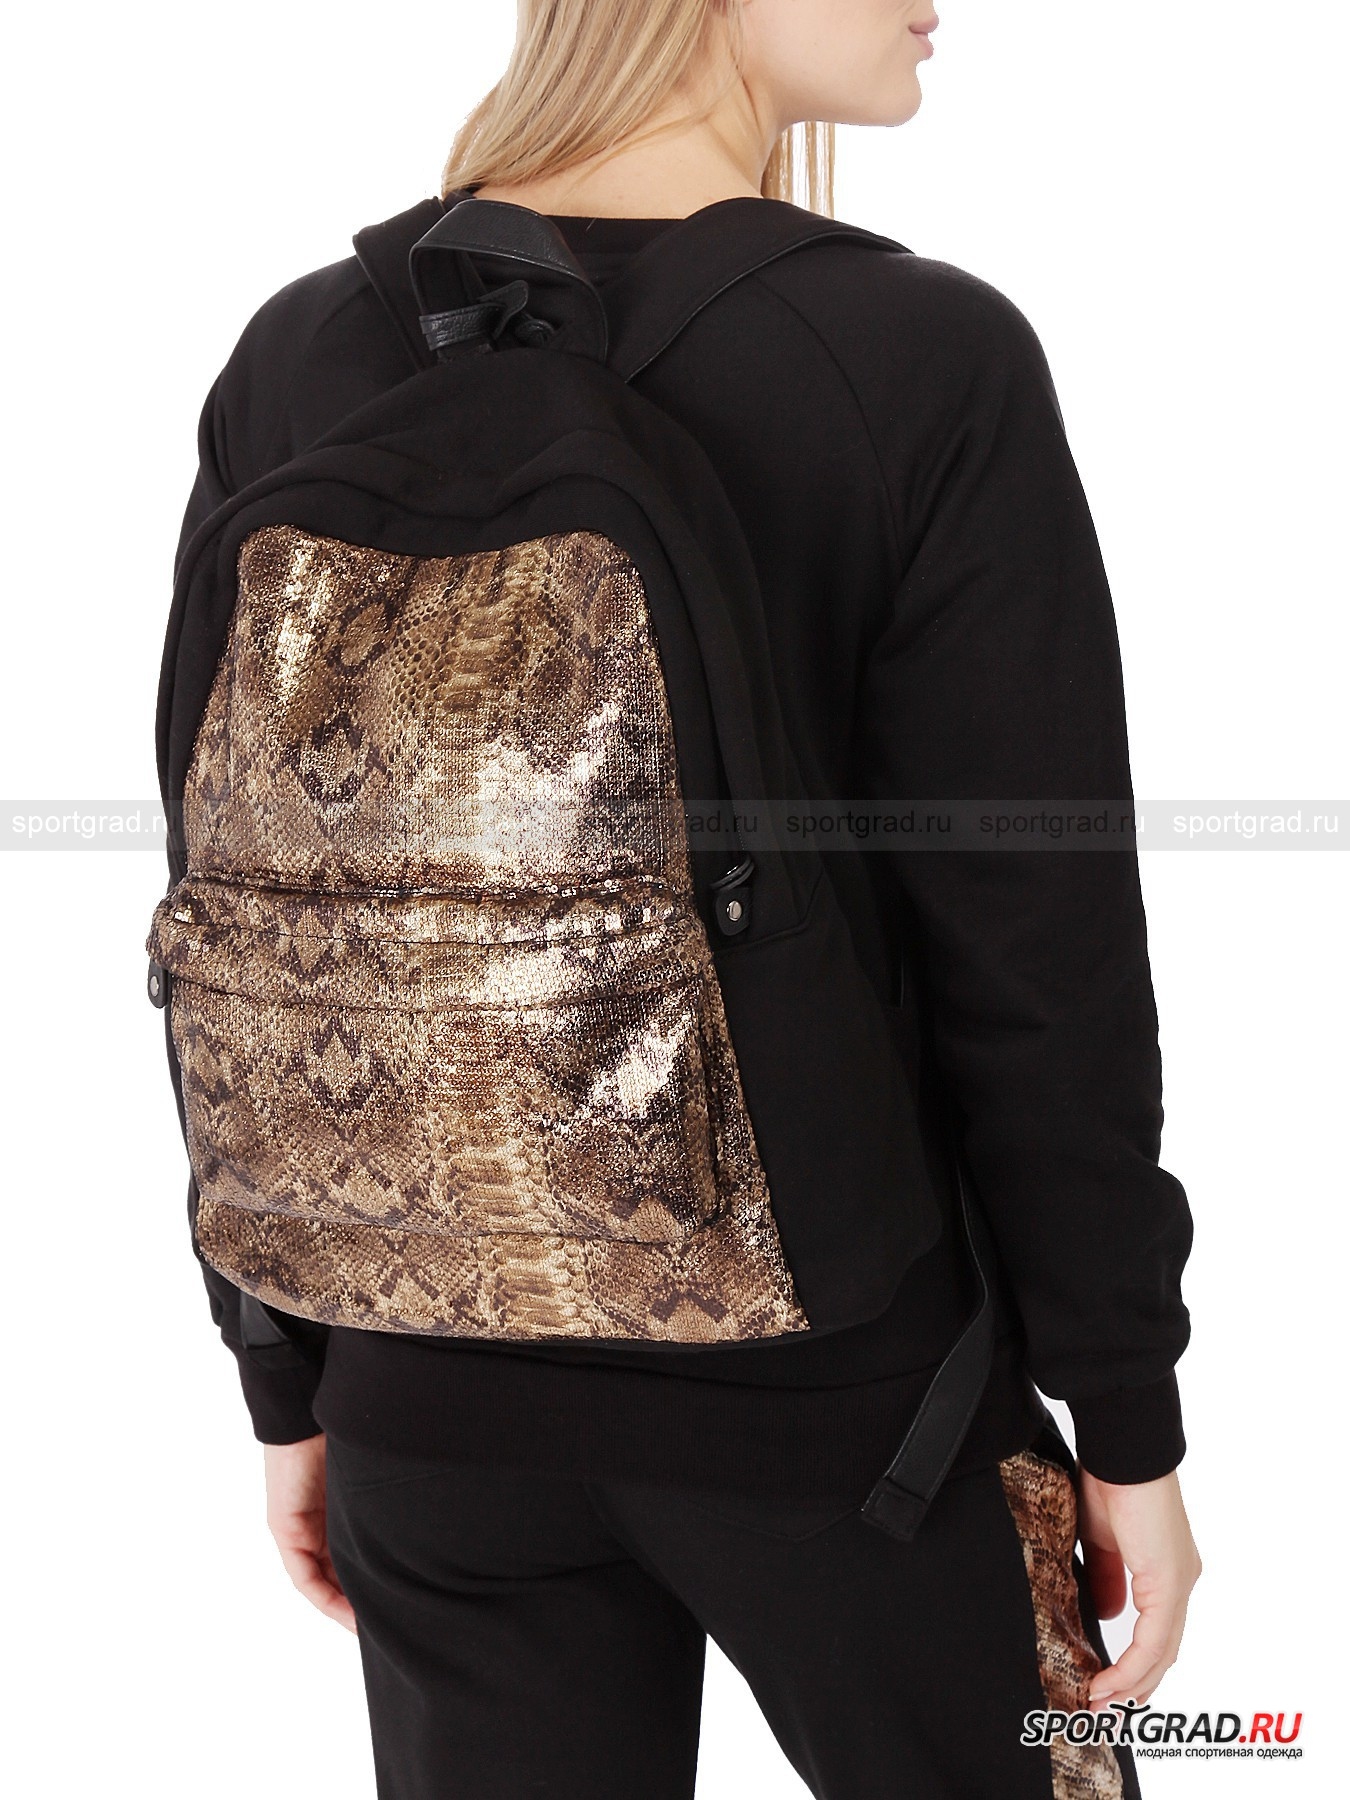 Рюкзак с анималистическим принтом DEHA от Спортград